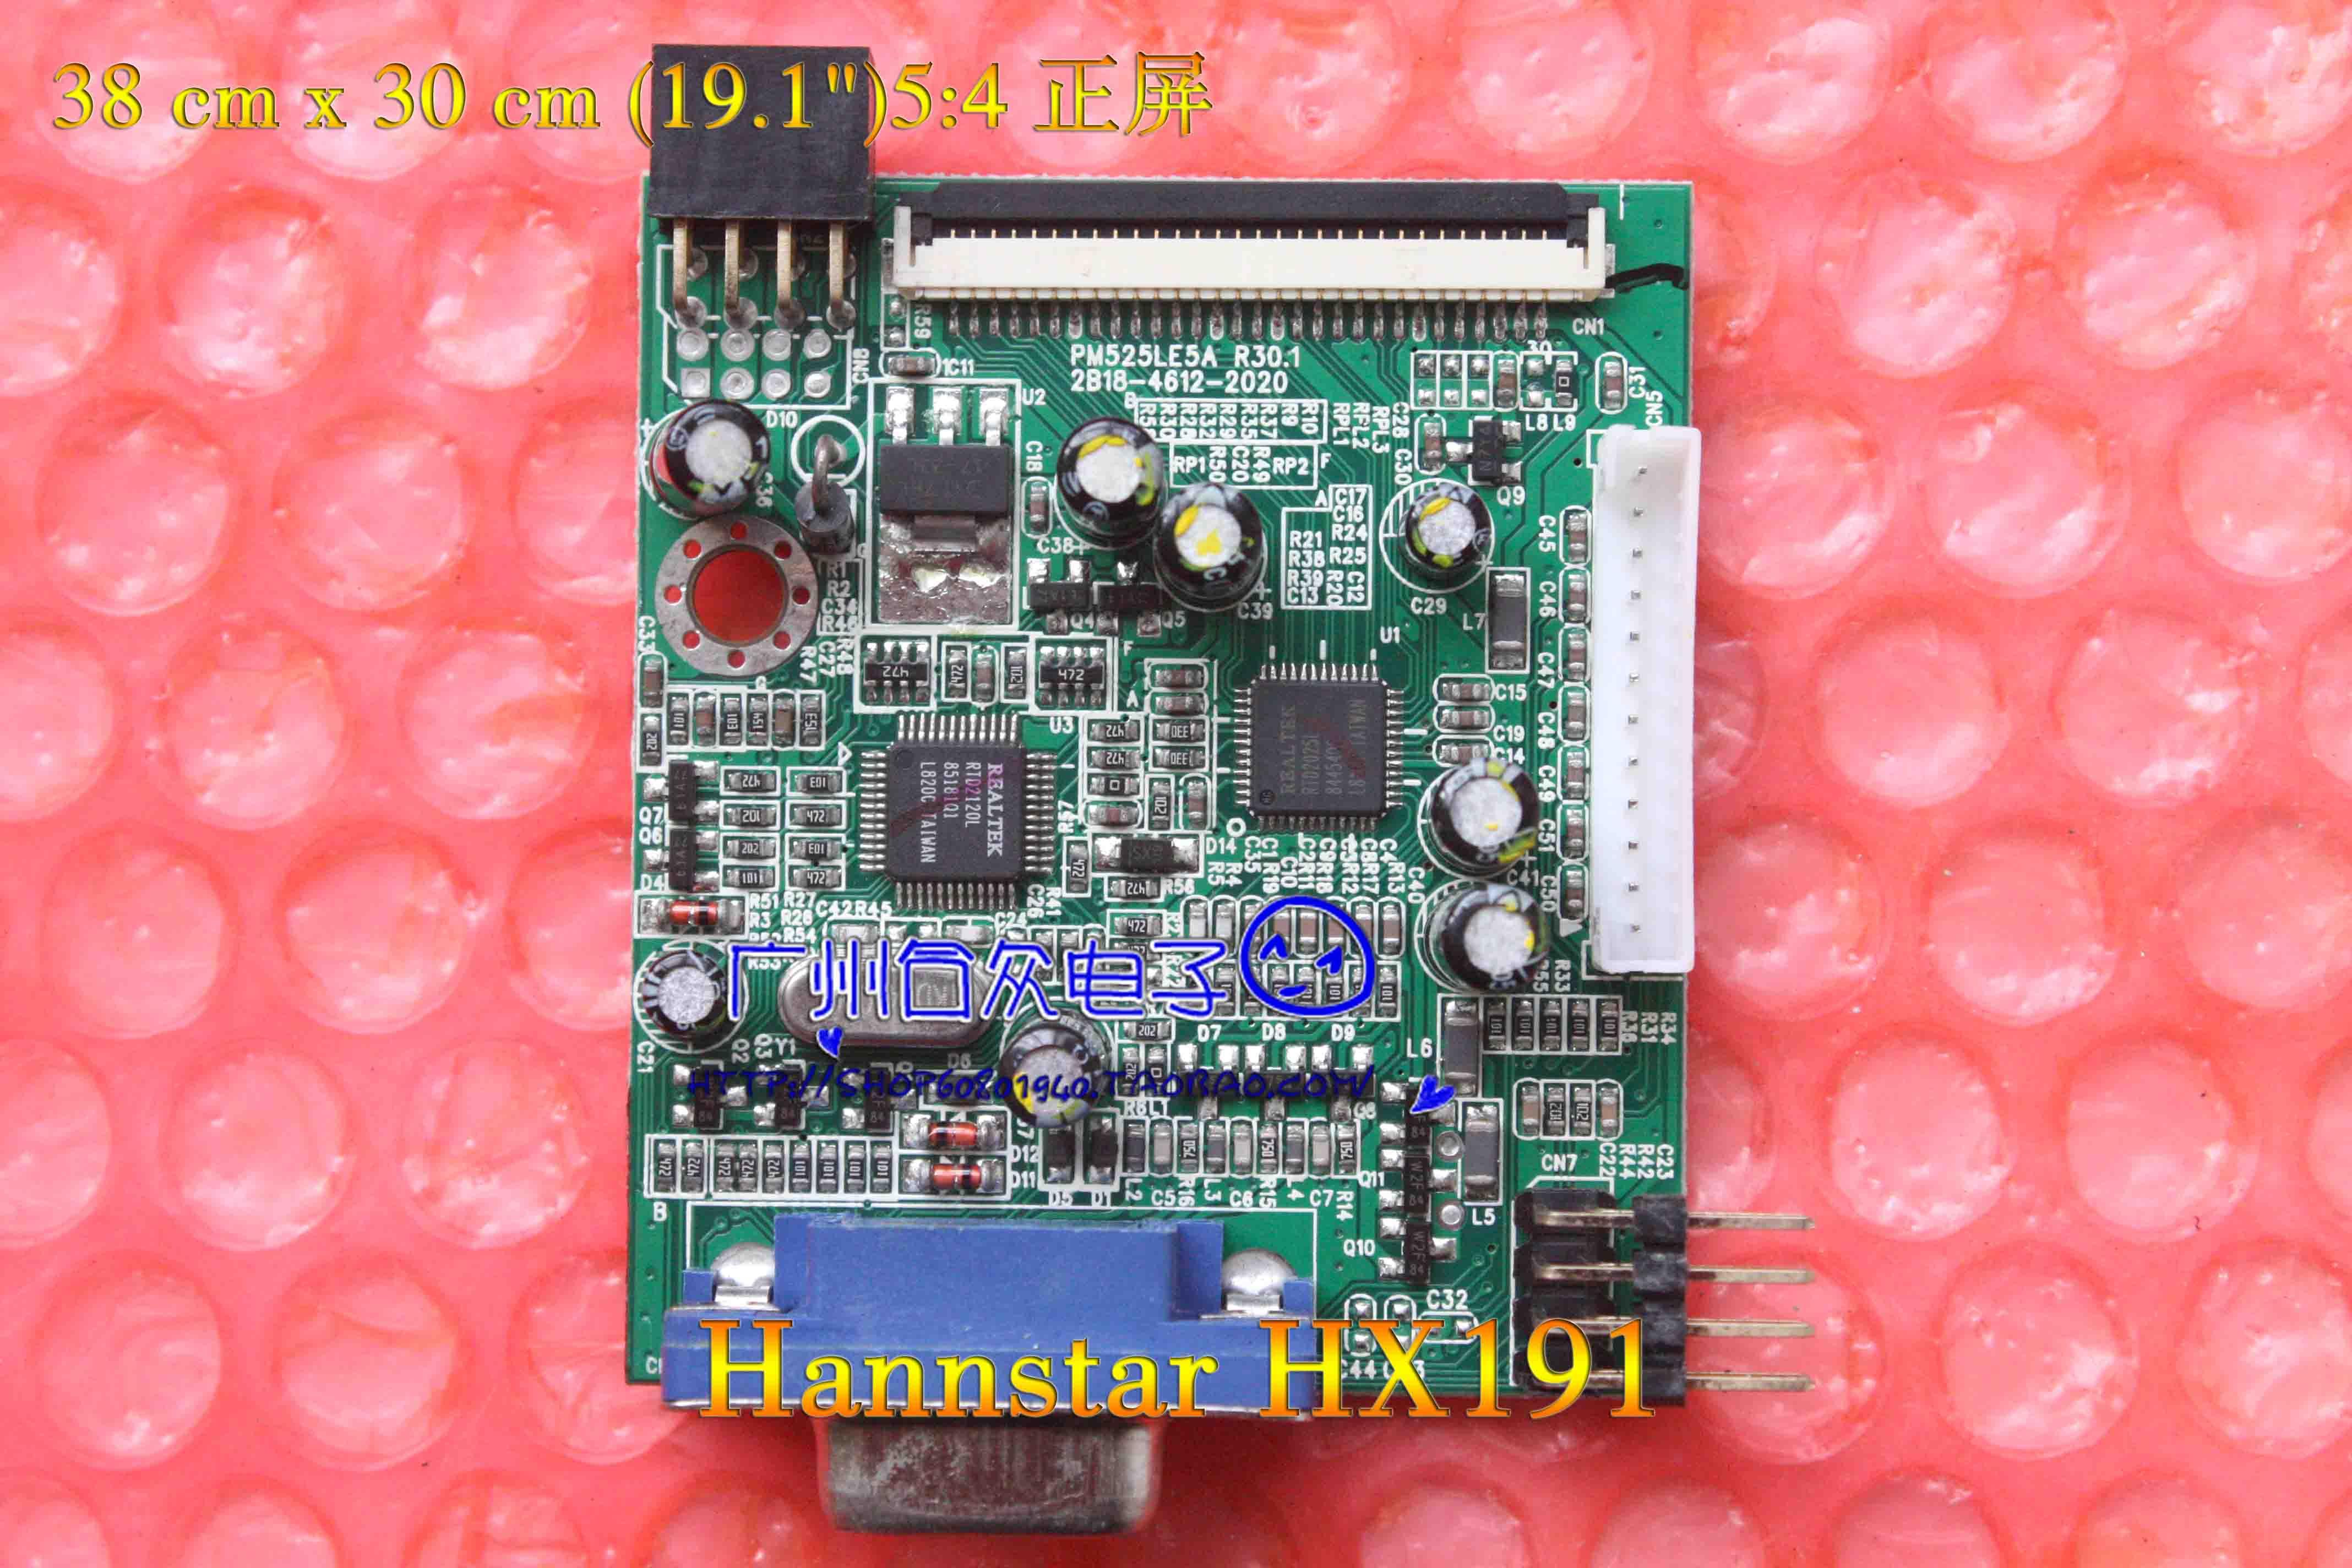 FREE SHIPPING Original hannstar hx191 driver board pm525le5a r30.1 motherboard logic board(China (Mainland))